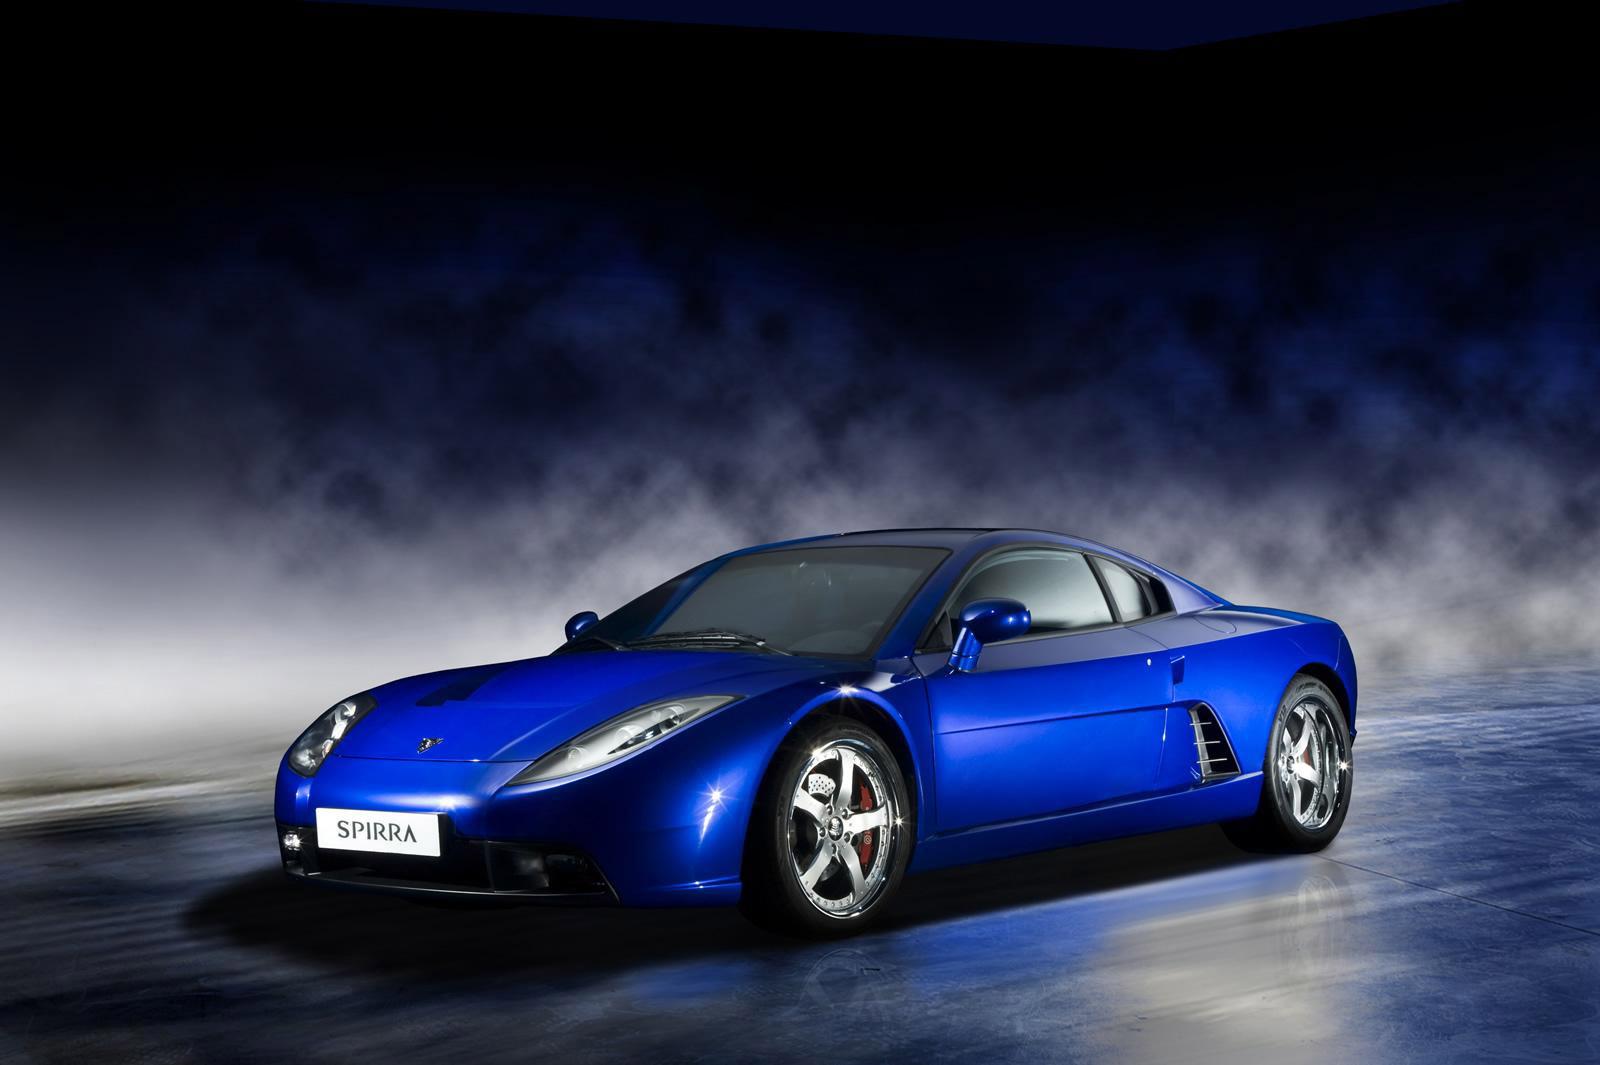 The Spirra Korean Super Sports Car